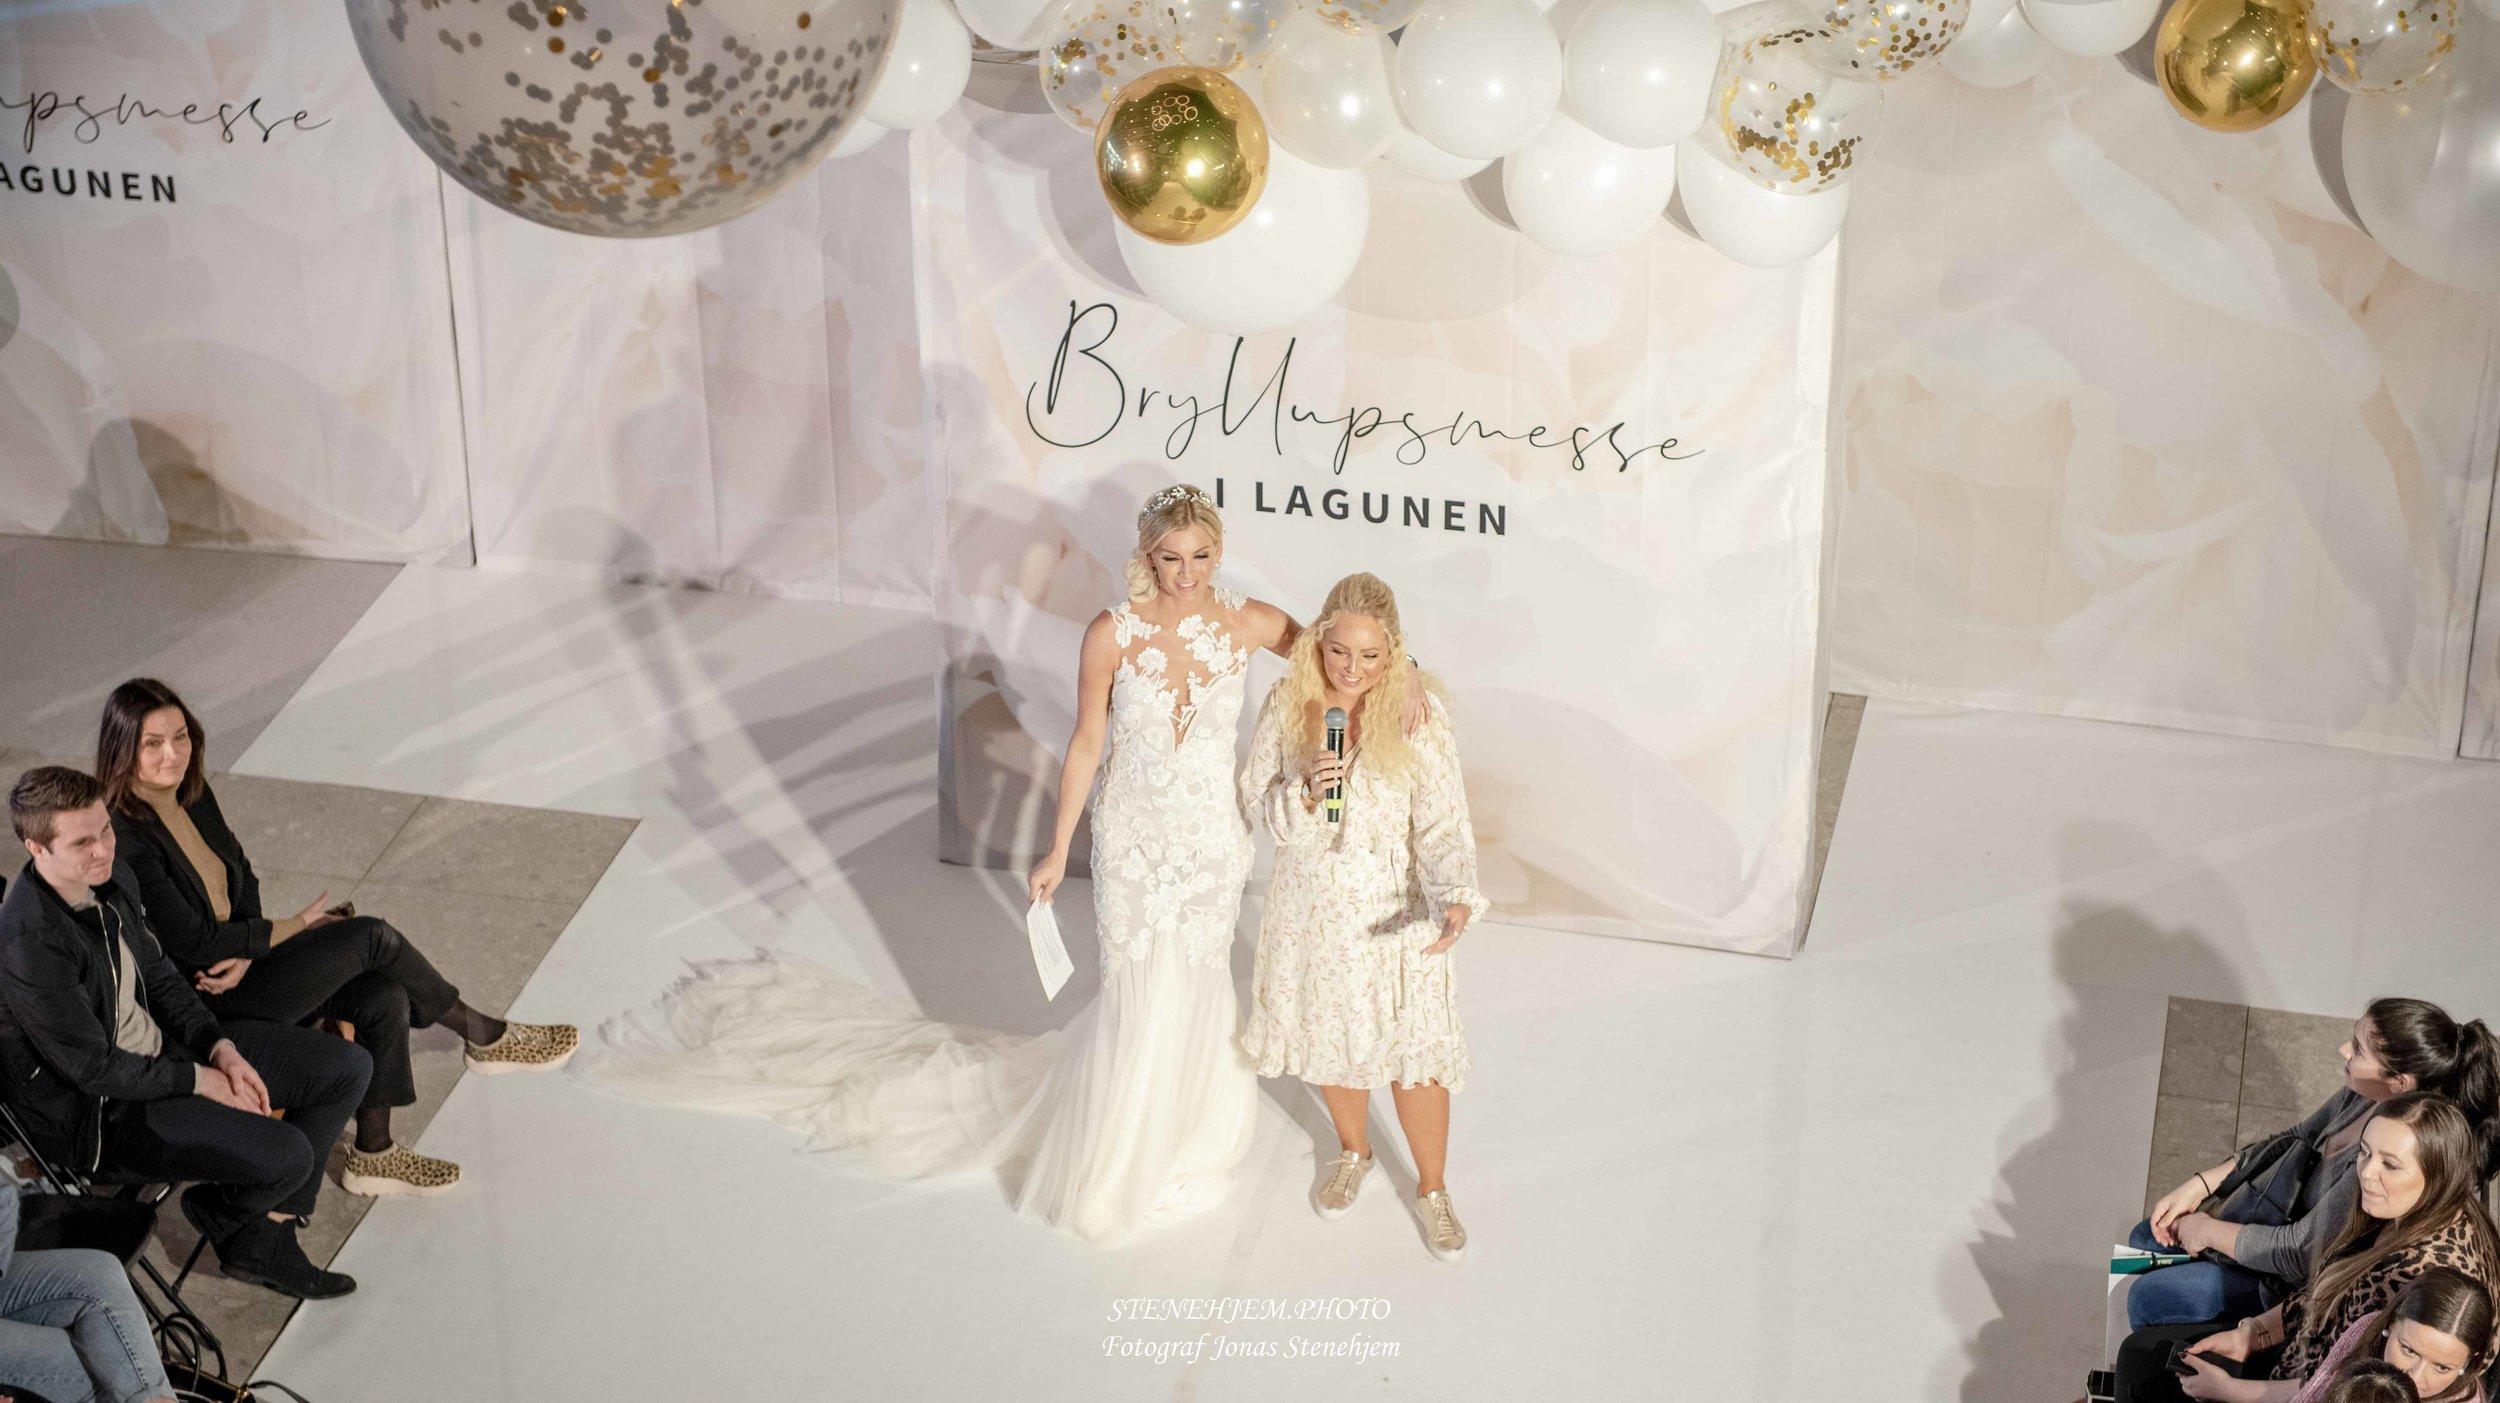 Bryllupsmesse_Lagunen_mittaltweddingfair__096.jpg